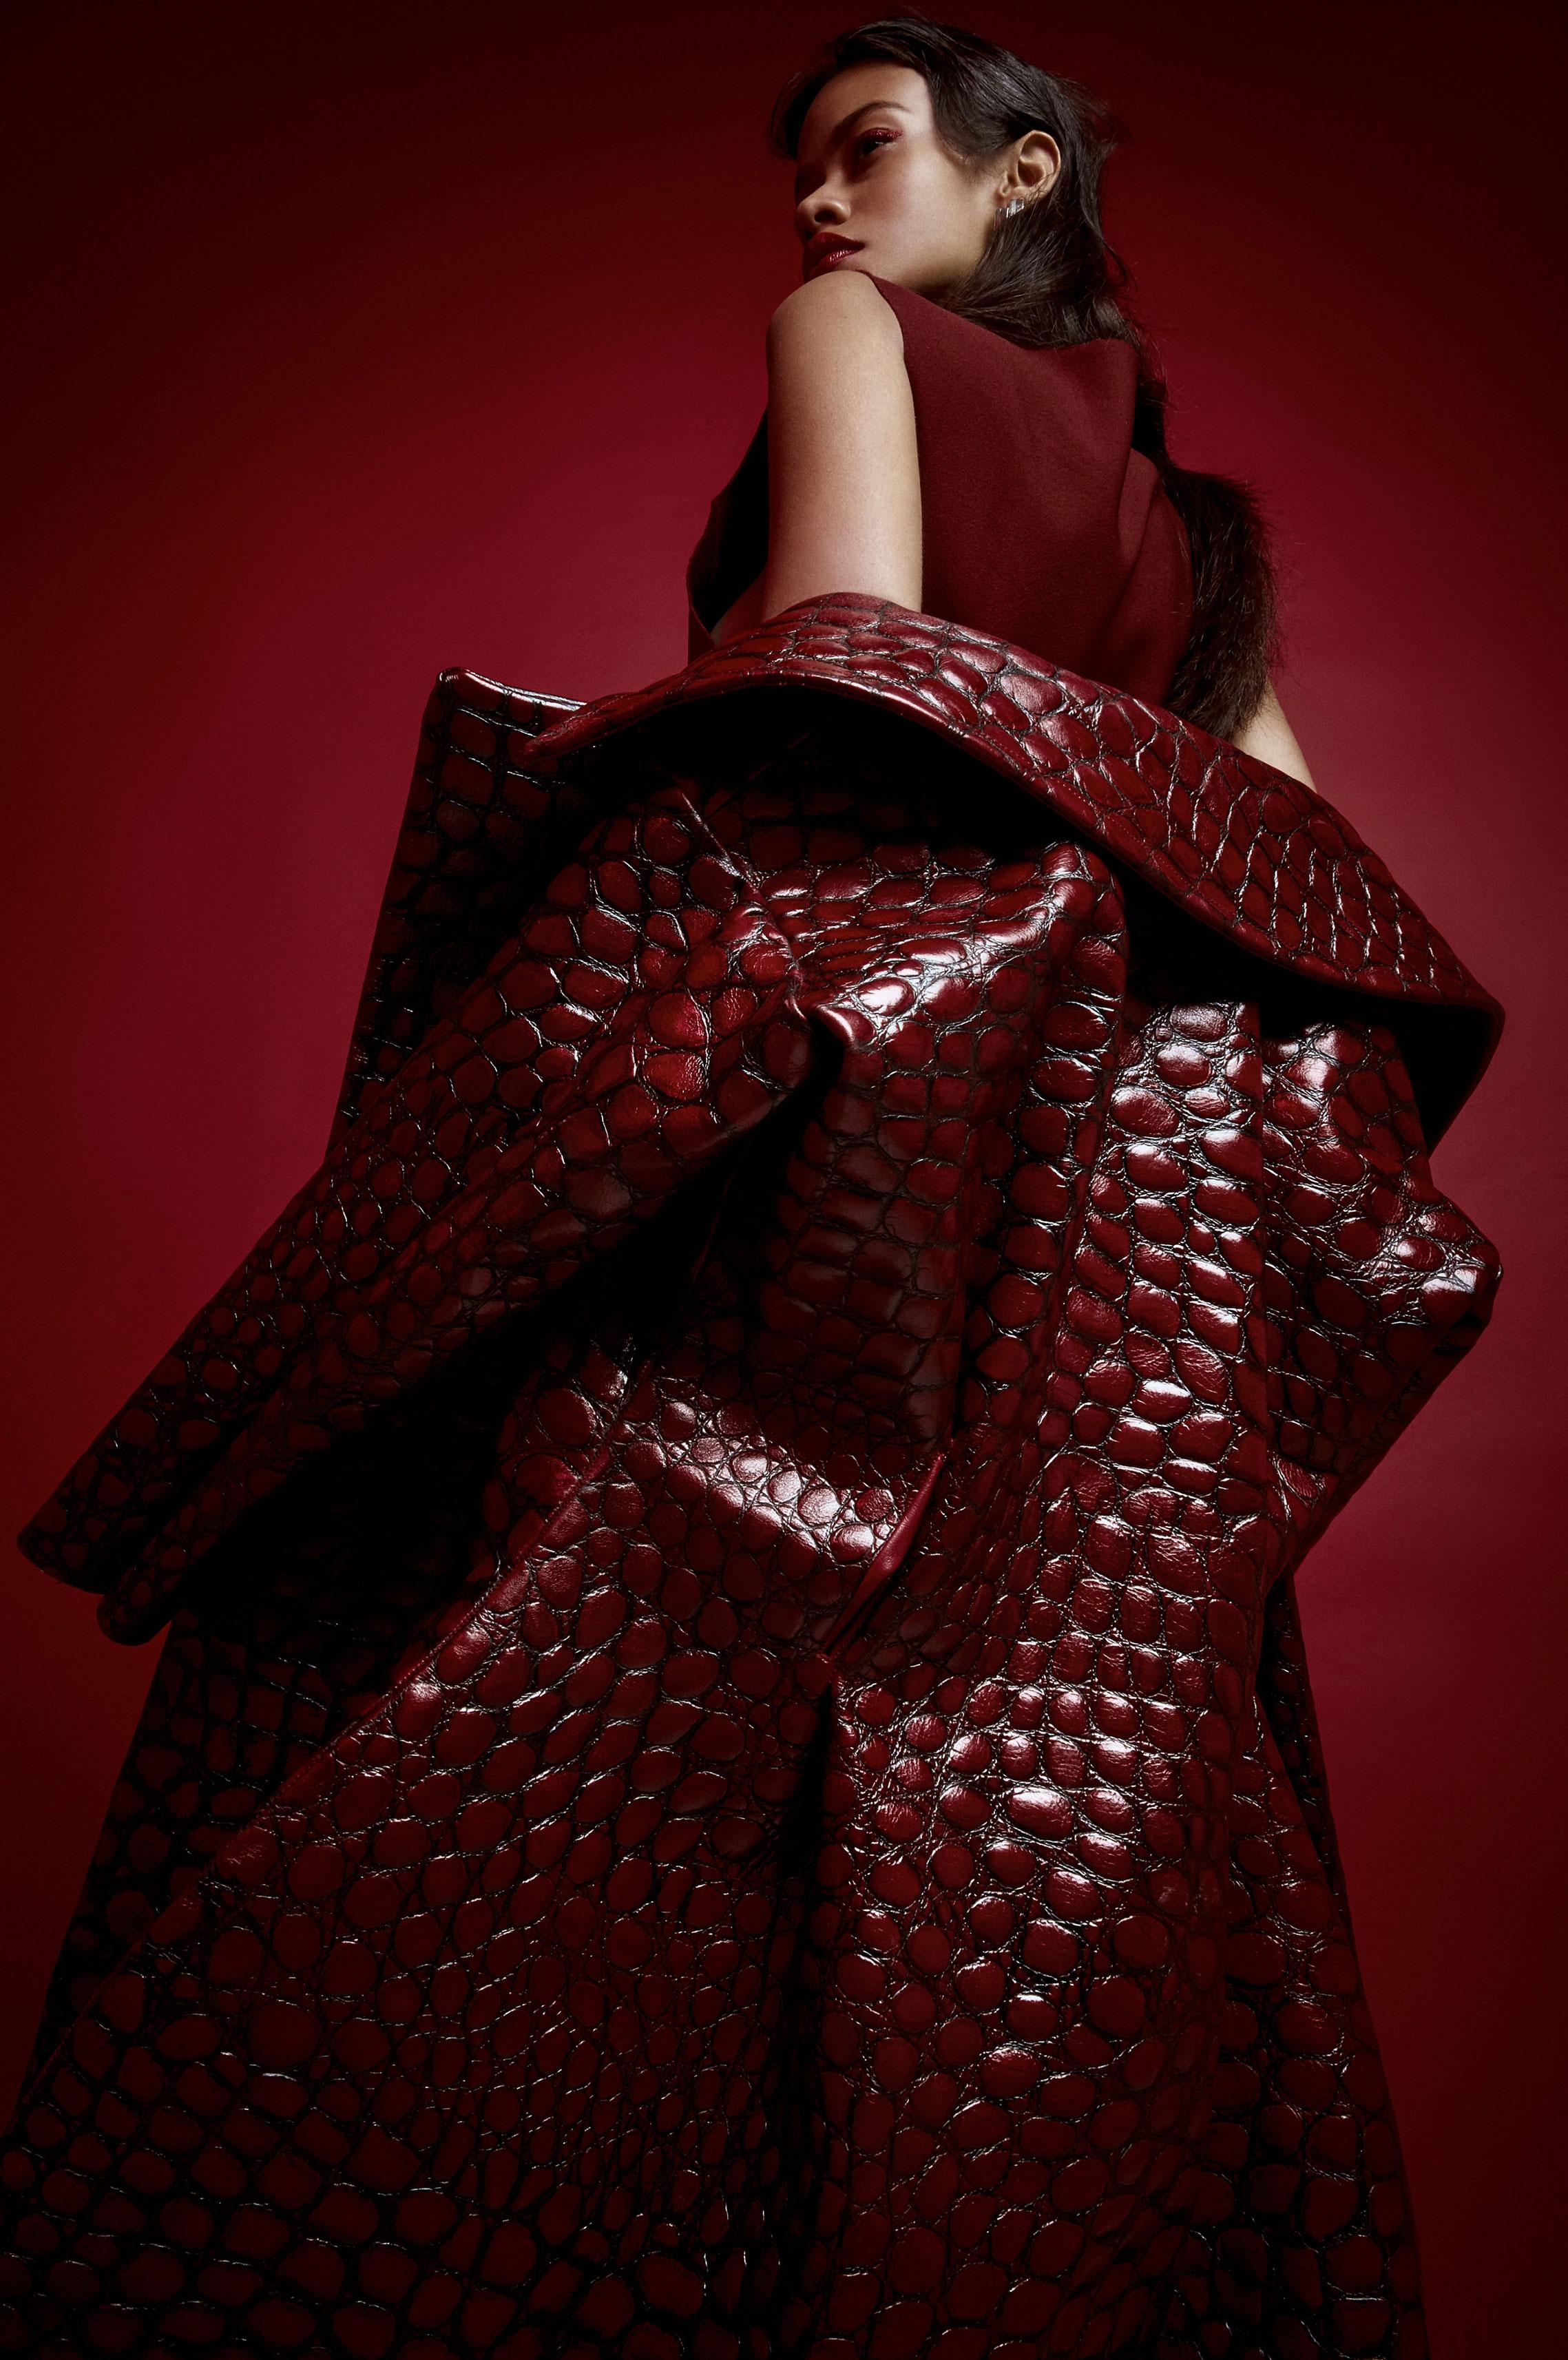 Таис Мартинс - женщина в красном / фото 09